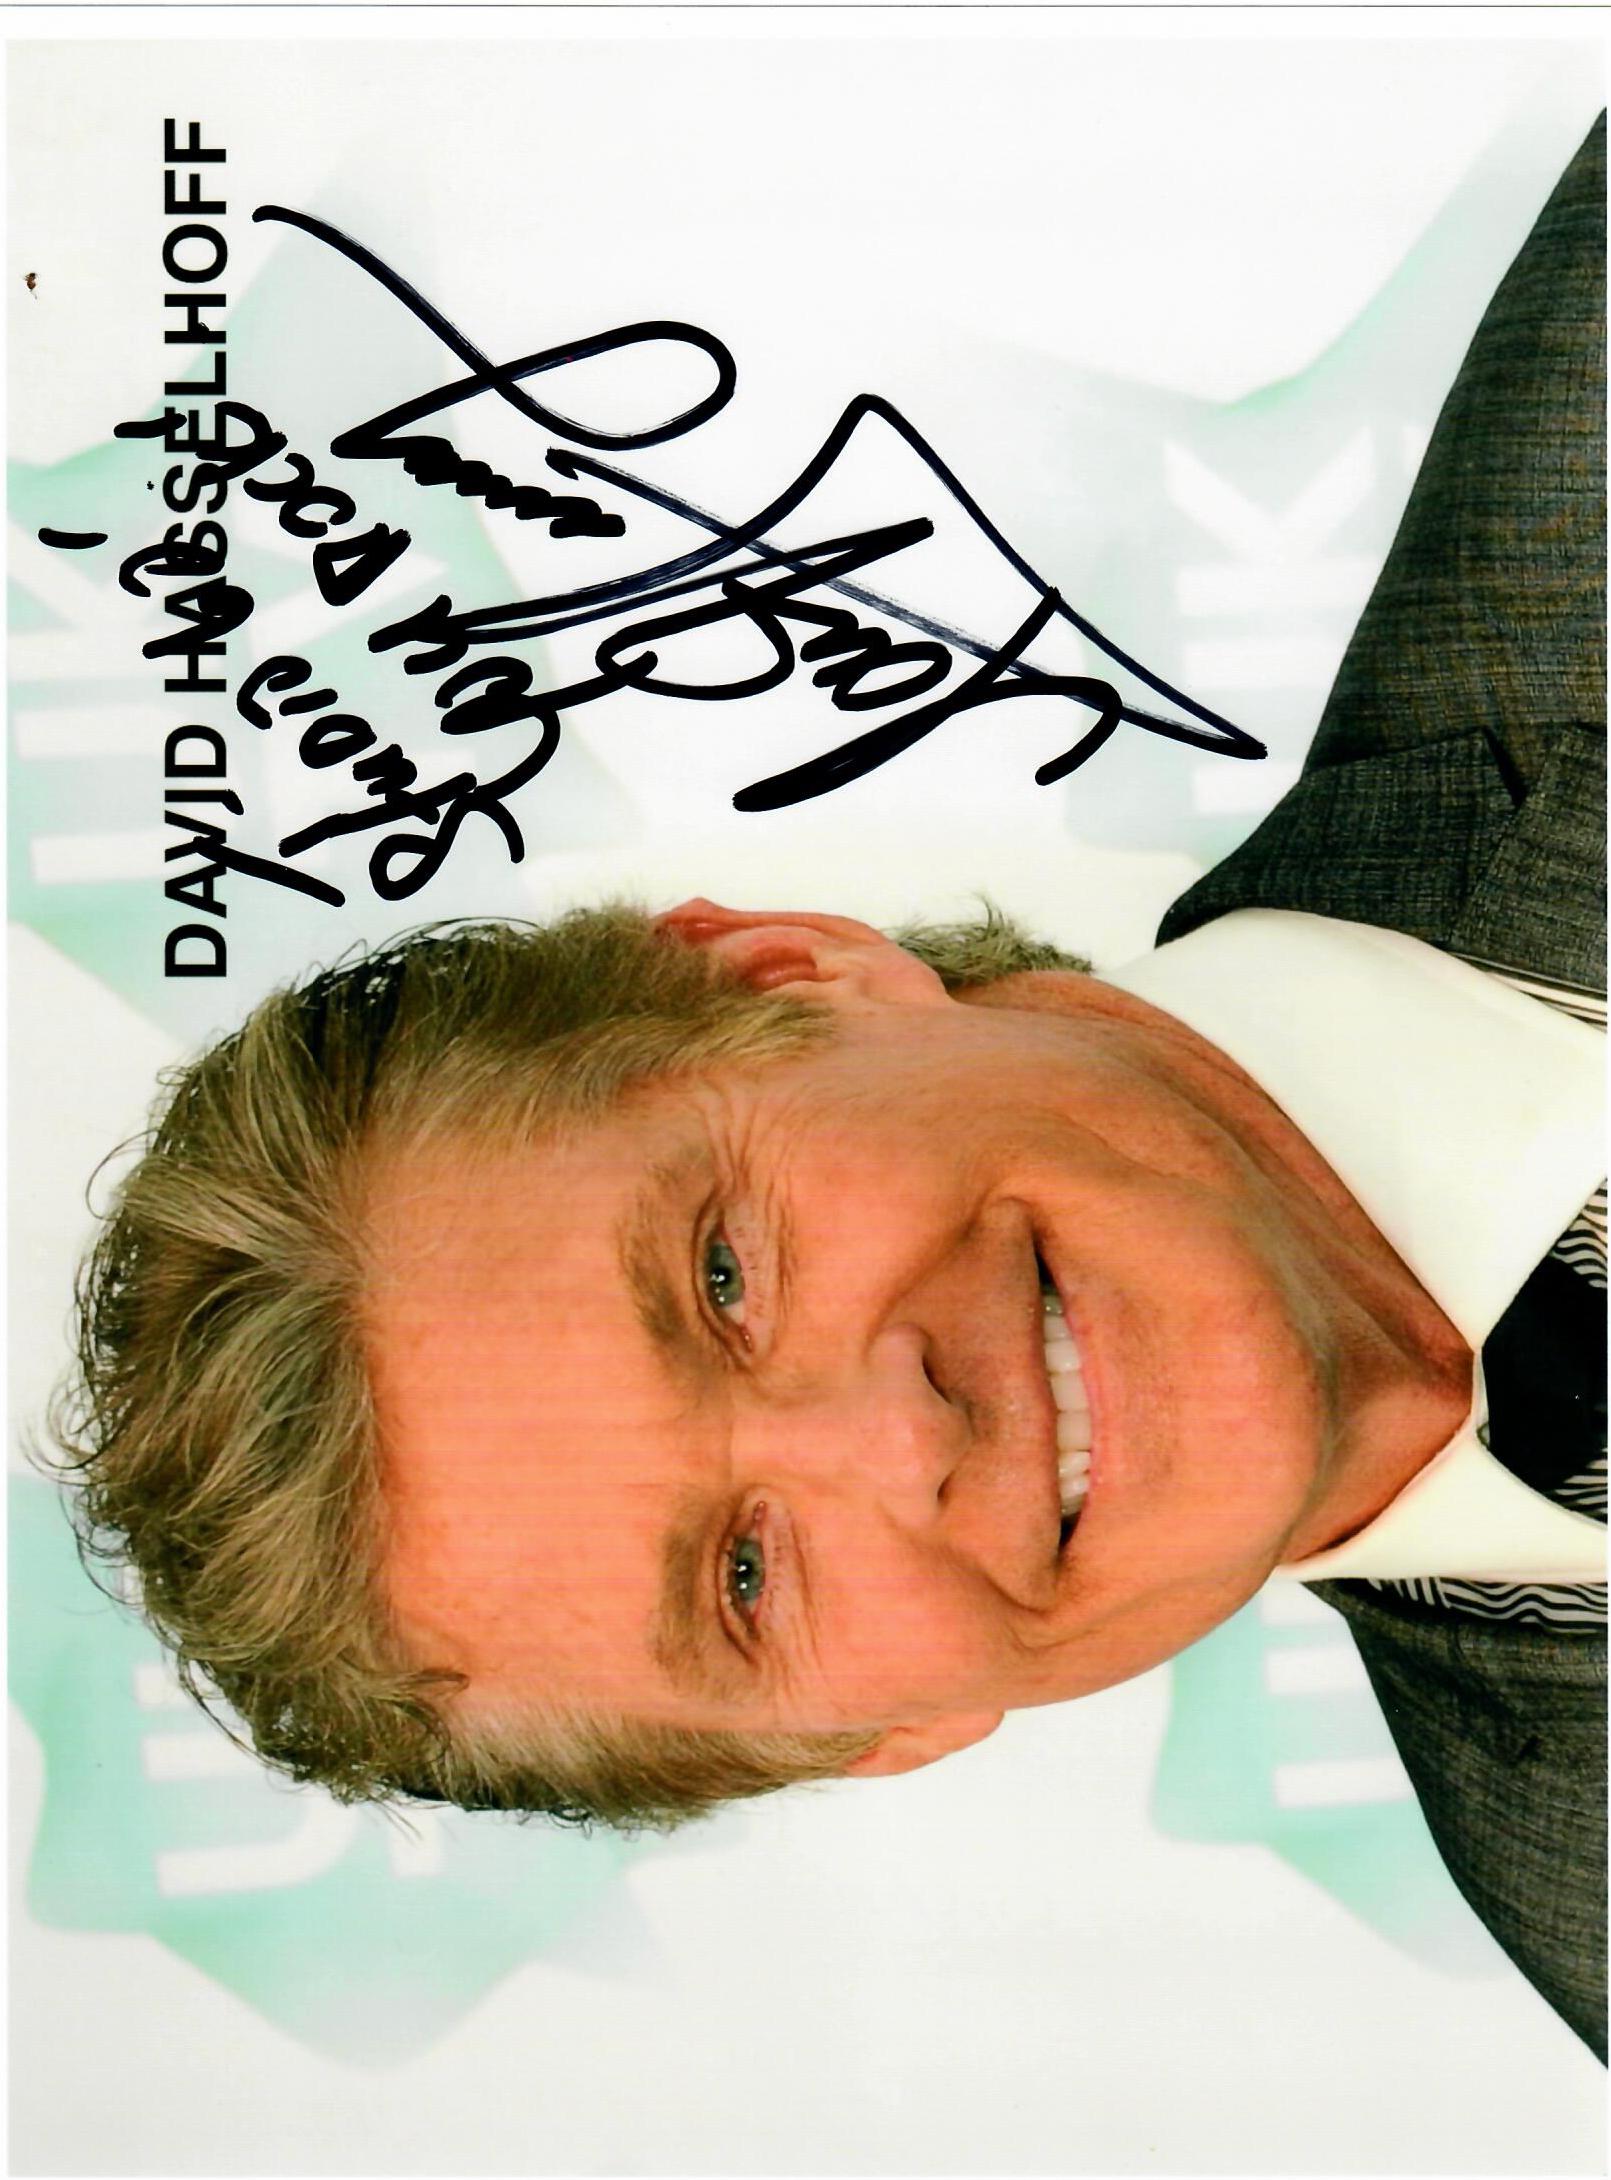 David Hasselhoff Autograph